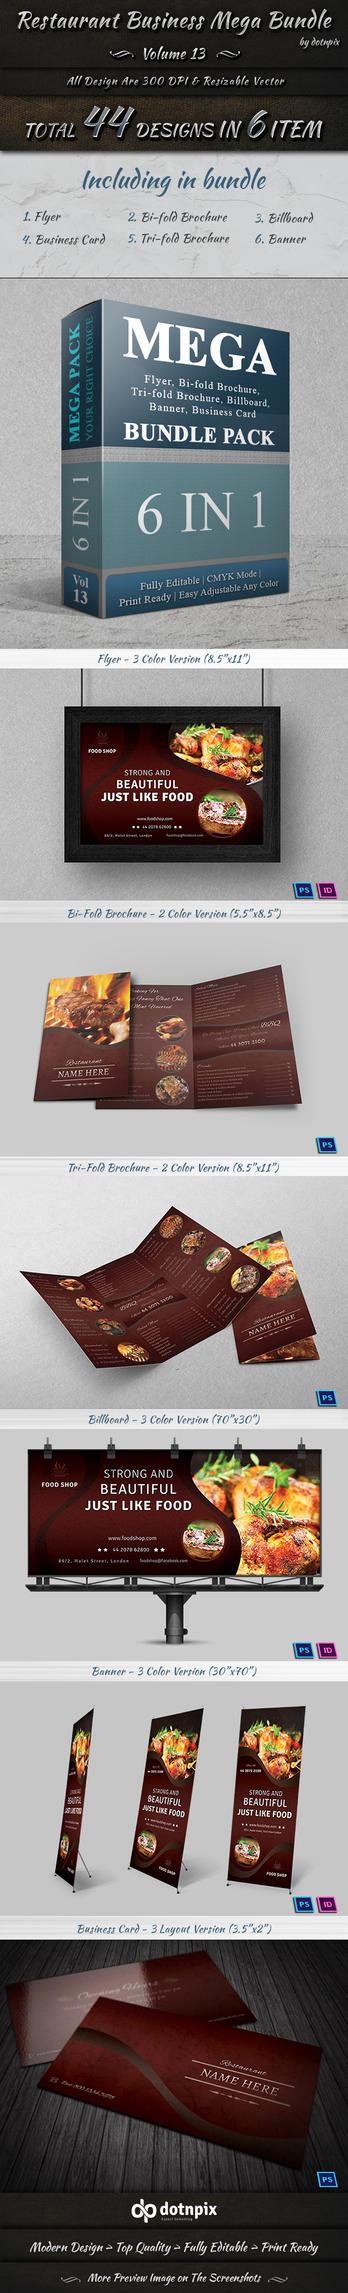 Restaurant Business Mega Bundle | Volume 13 by dotnpix